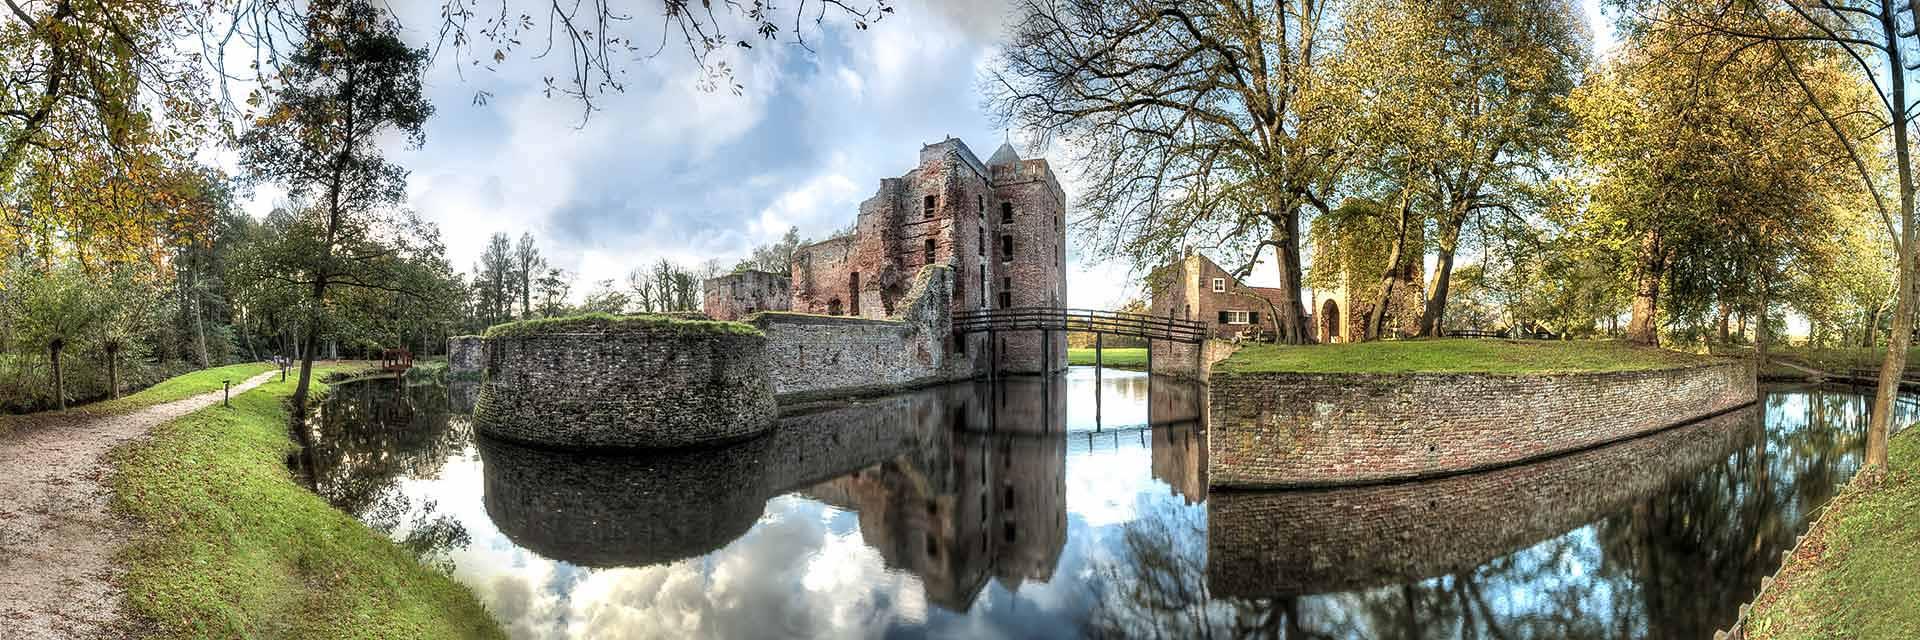 Diverse ruïnes in Nederland